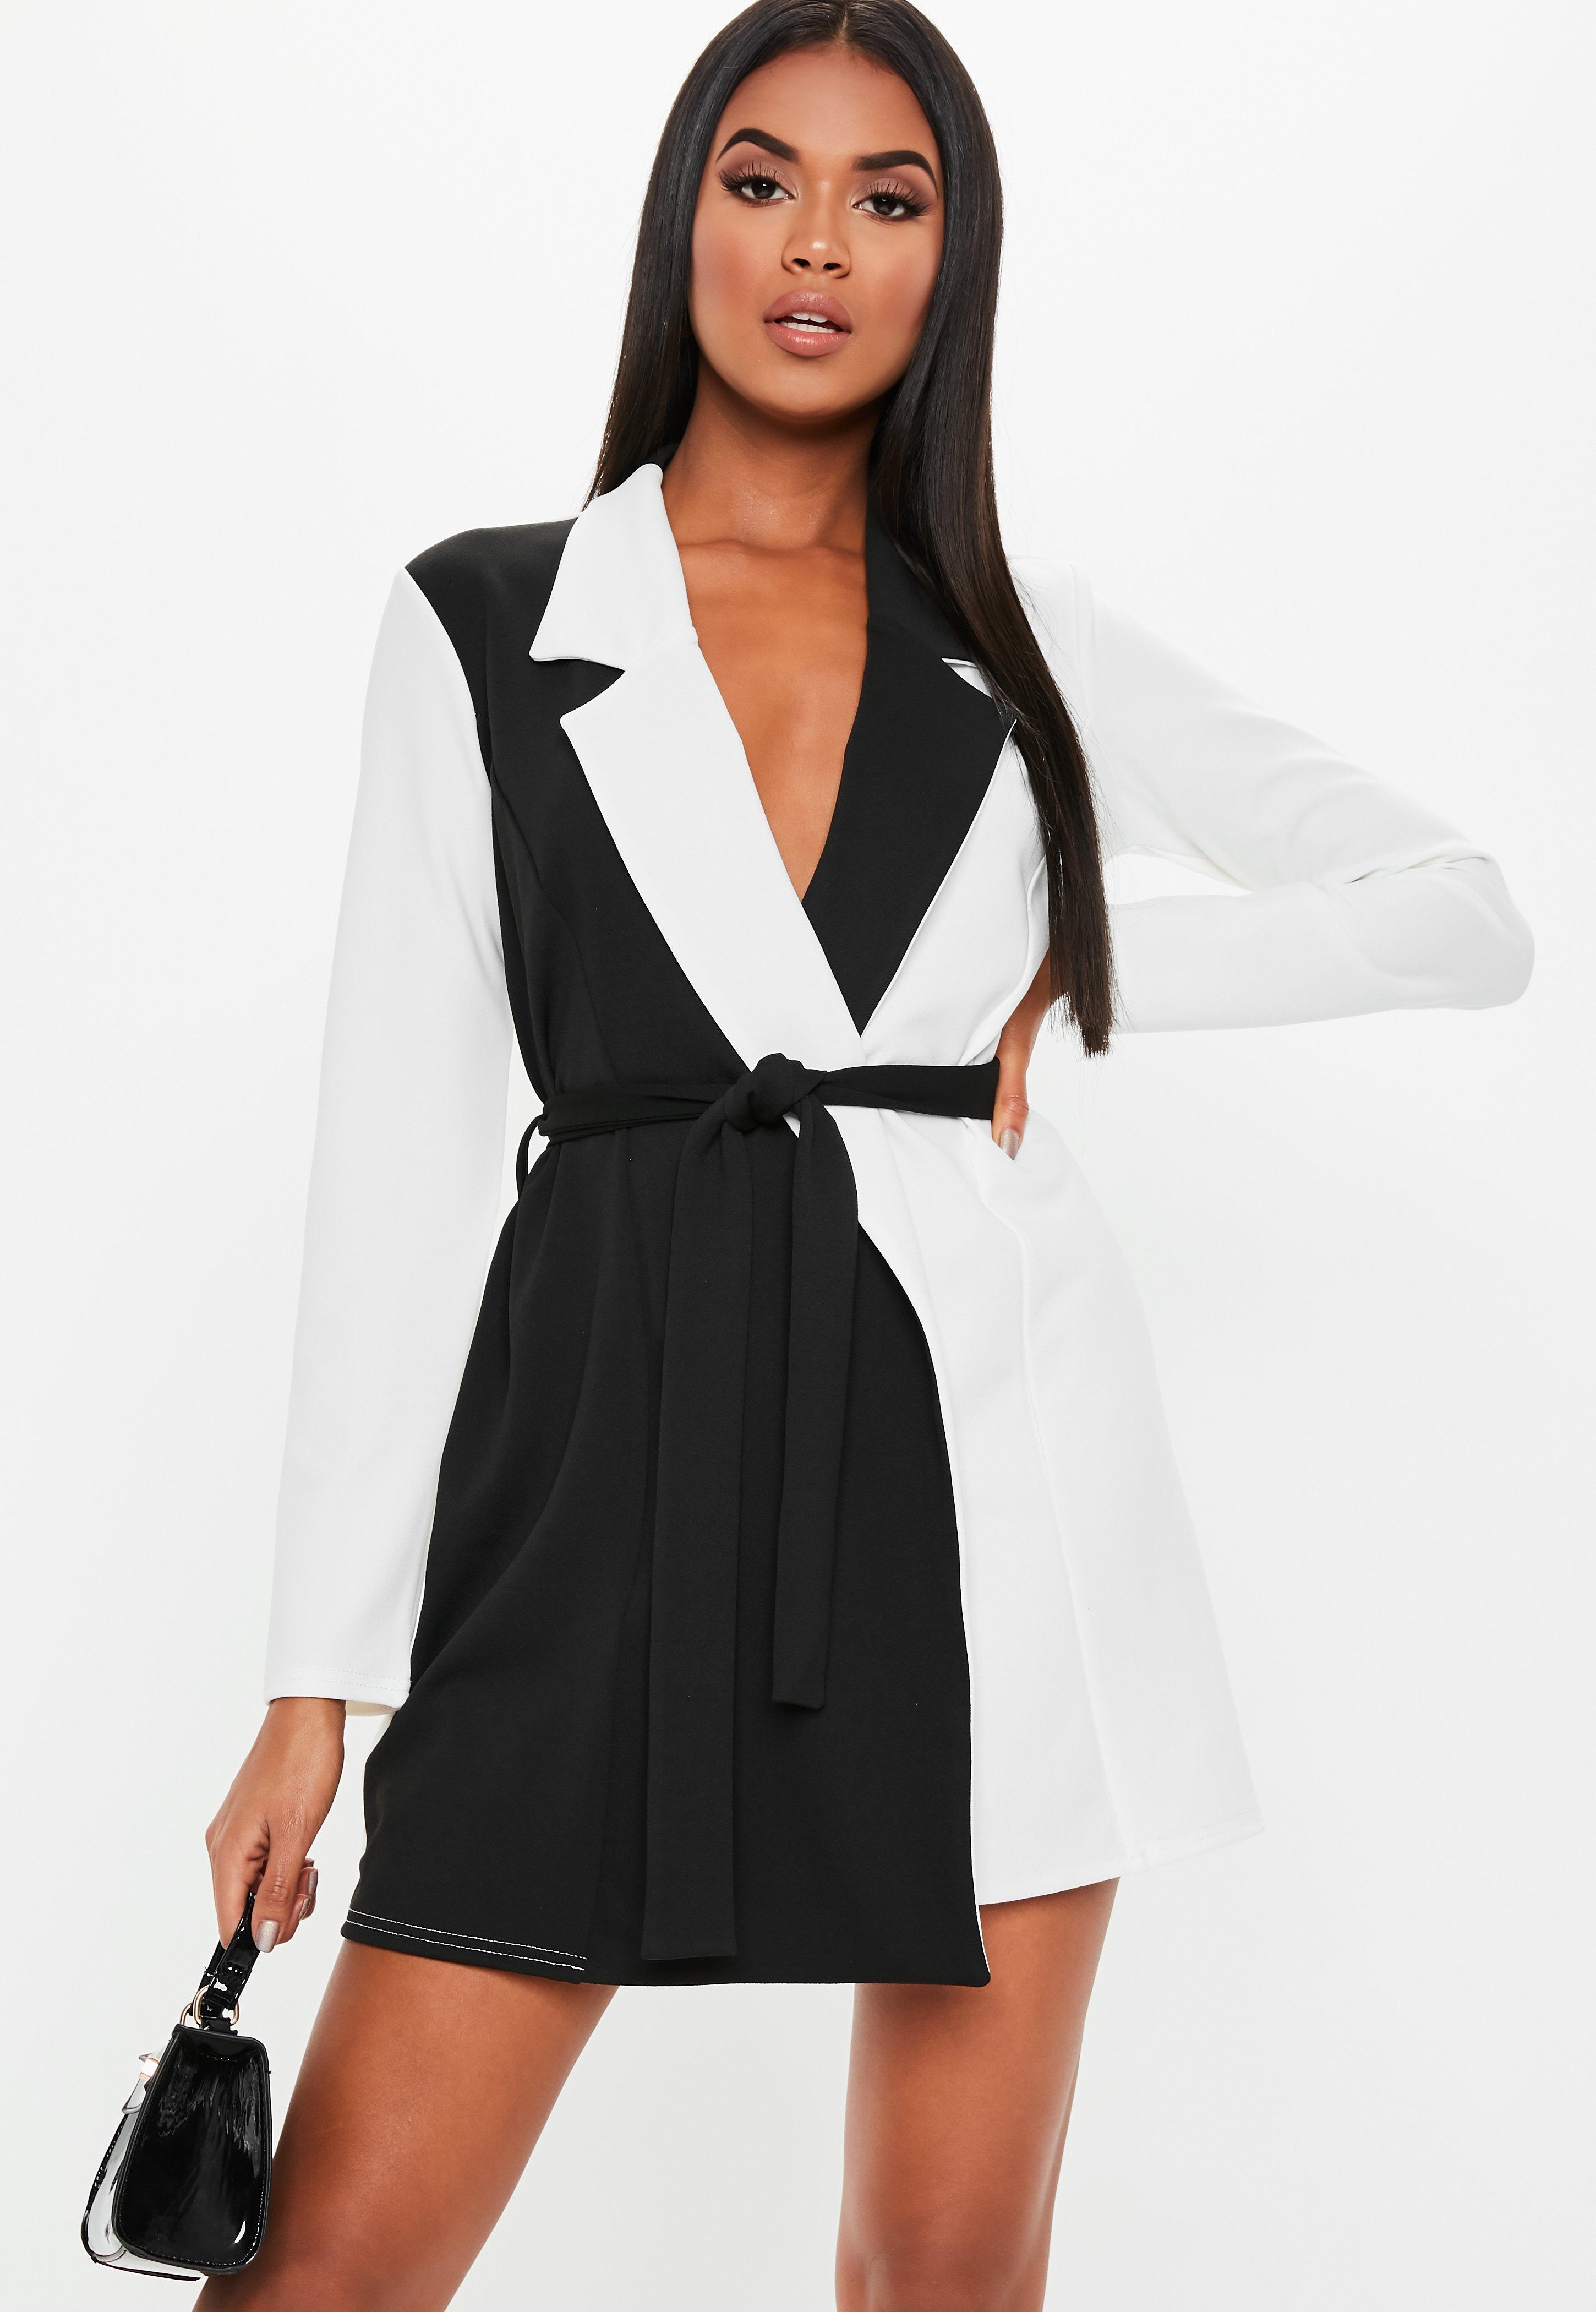 38be6fa41ec7 Vestido de manga larga en blanco y negro